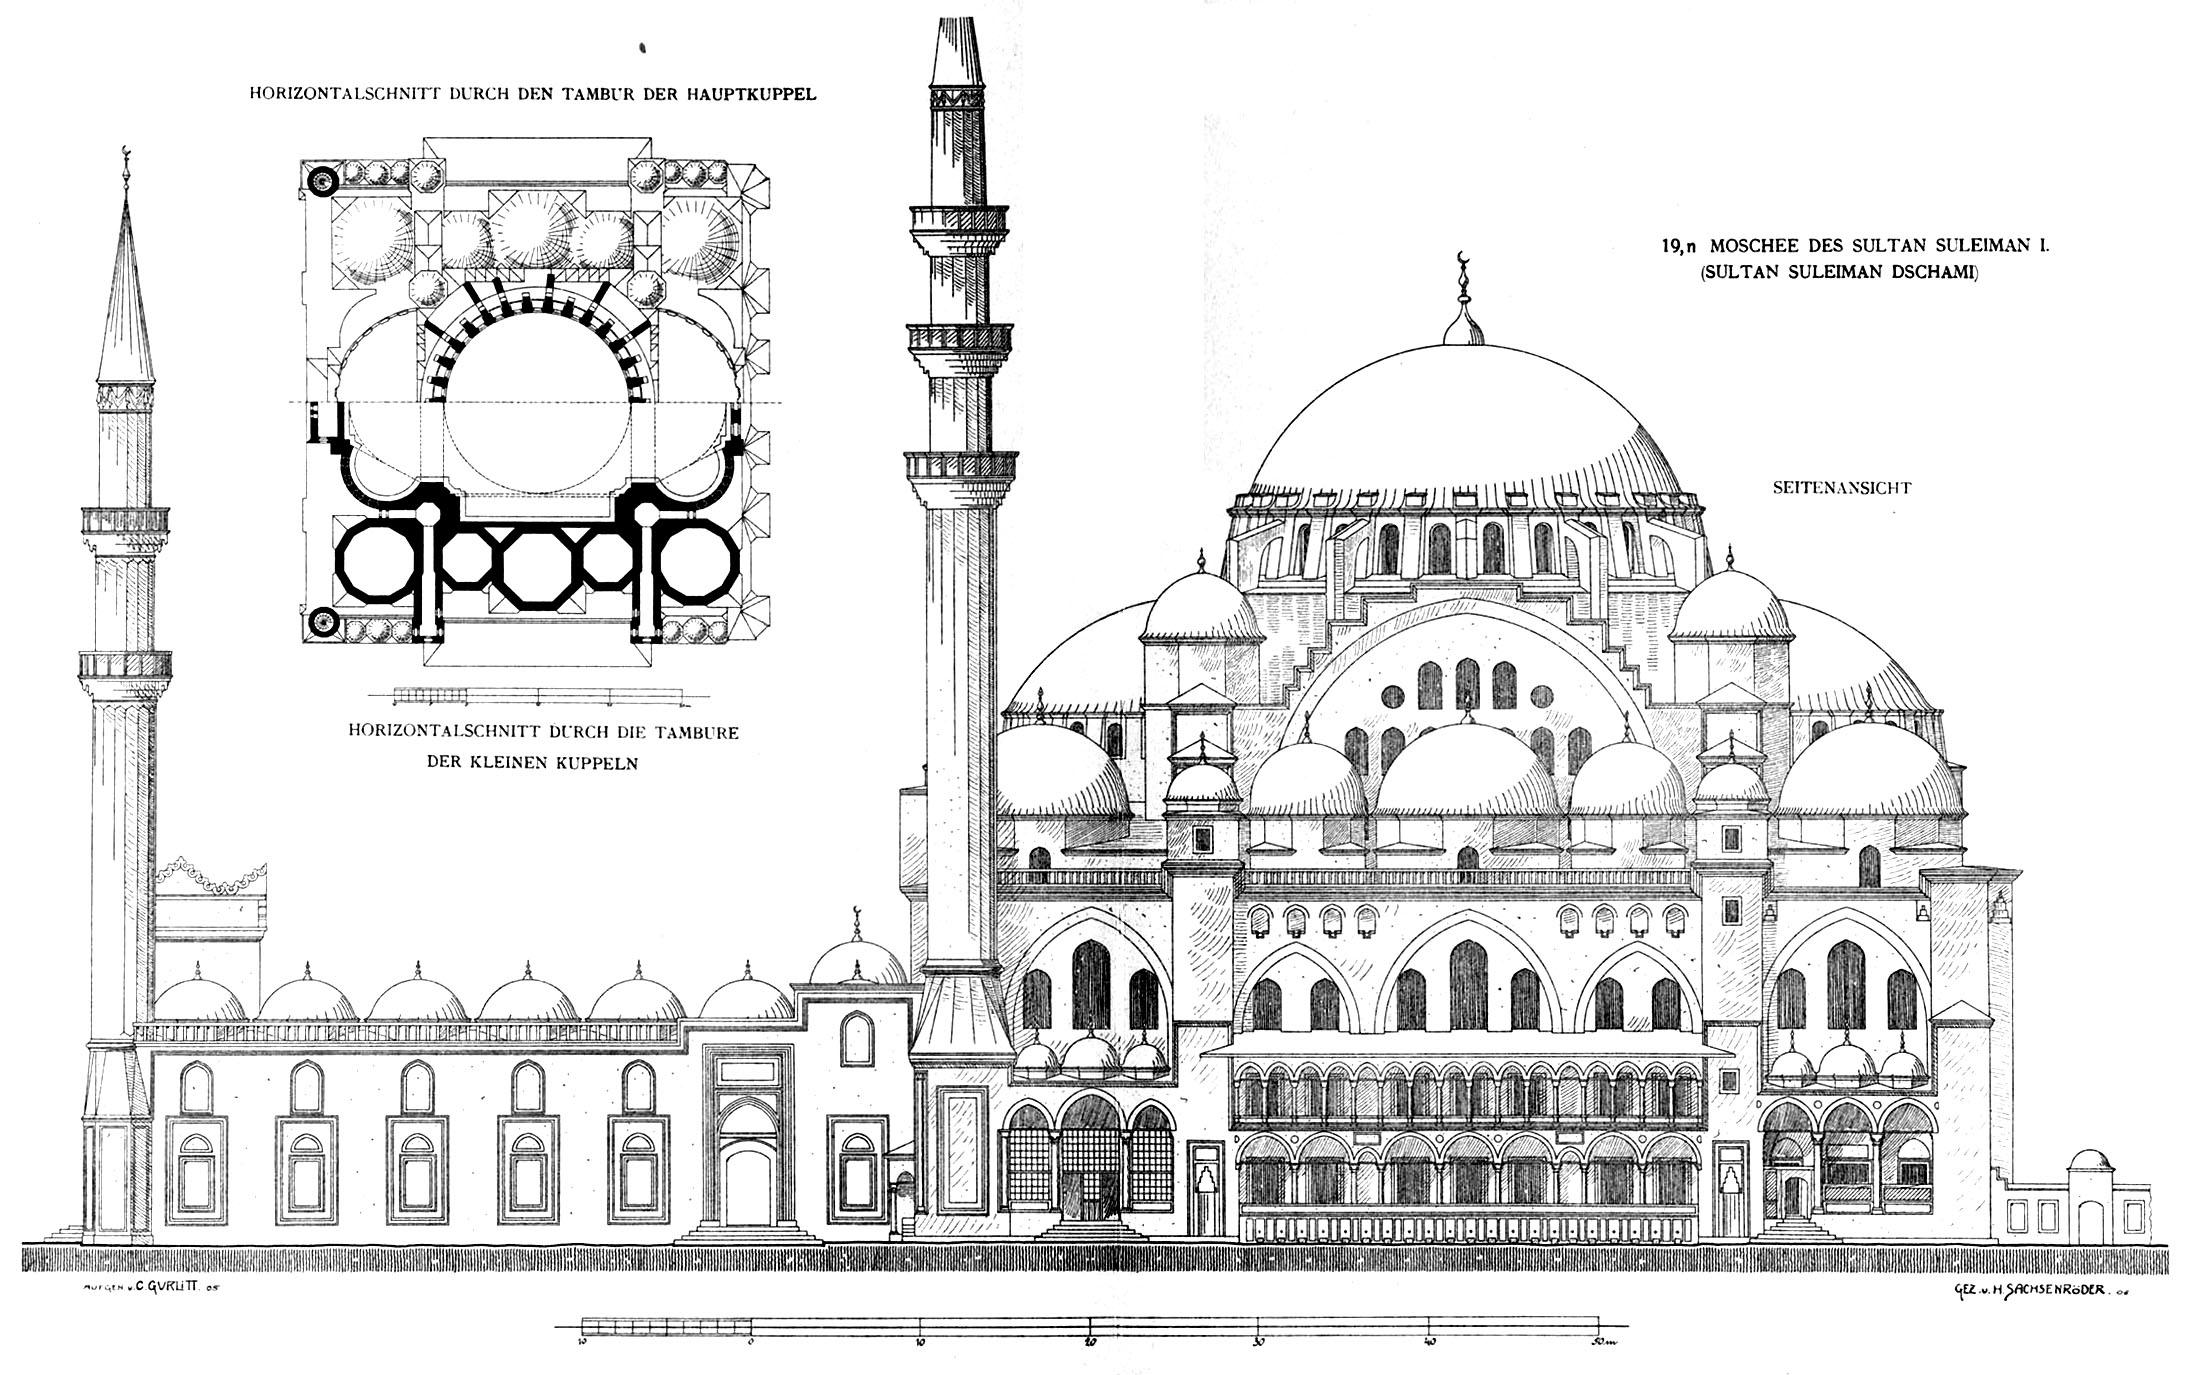 https://i1.wp.com/upload.wikimedia.org/wikipedia/commons/1/13/Suleymaniye_Mosque_cleaned_Gurlitt_1912.jpg